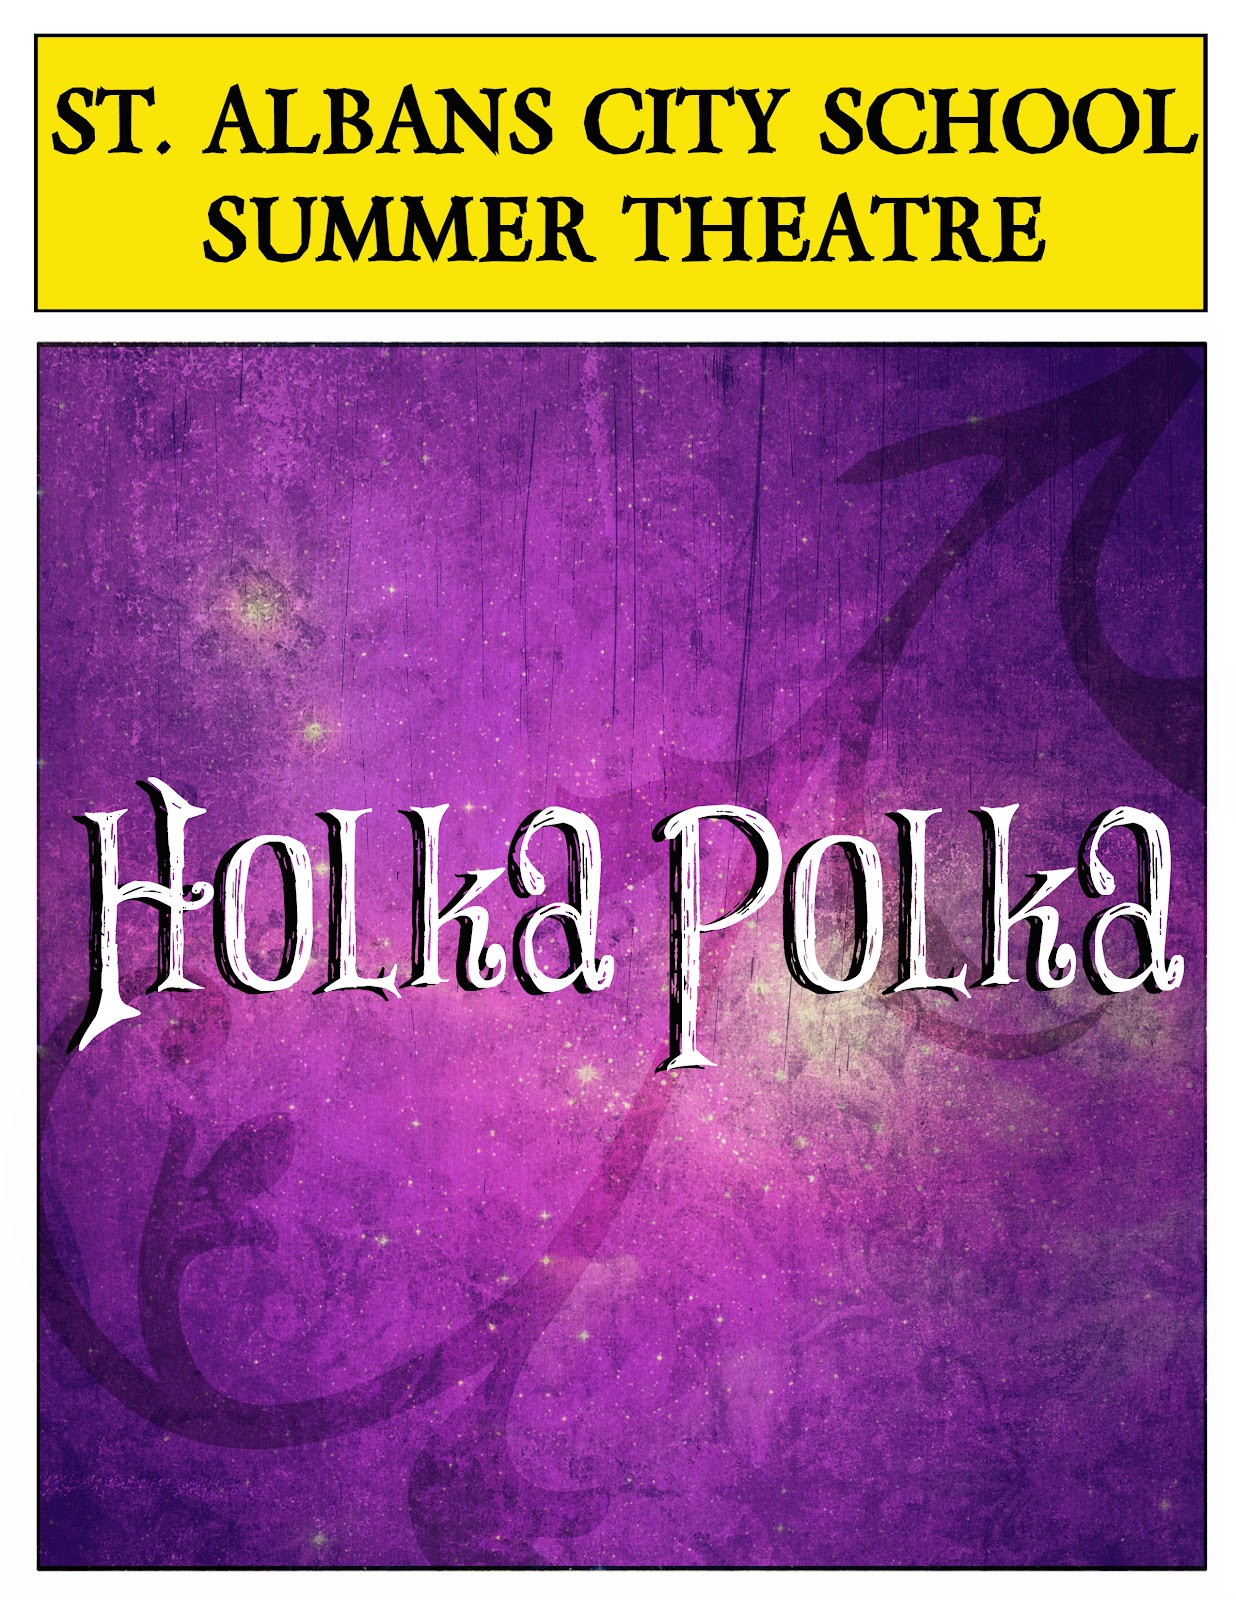 Holka Polka Playbill Cover.jpg